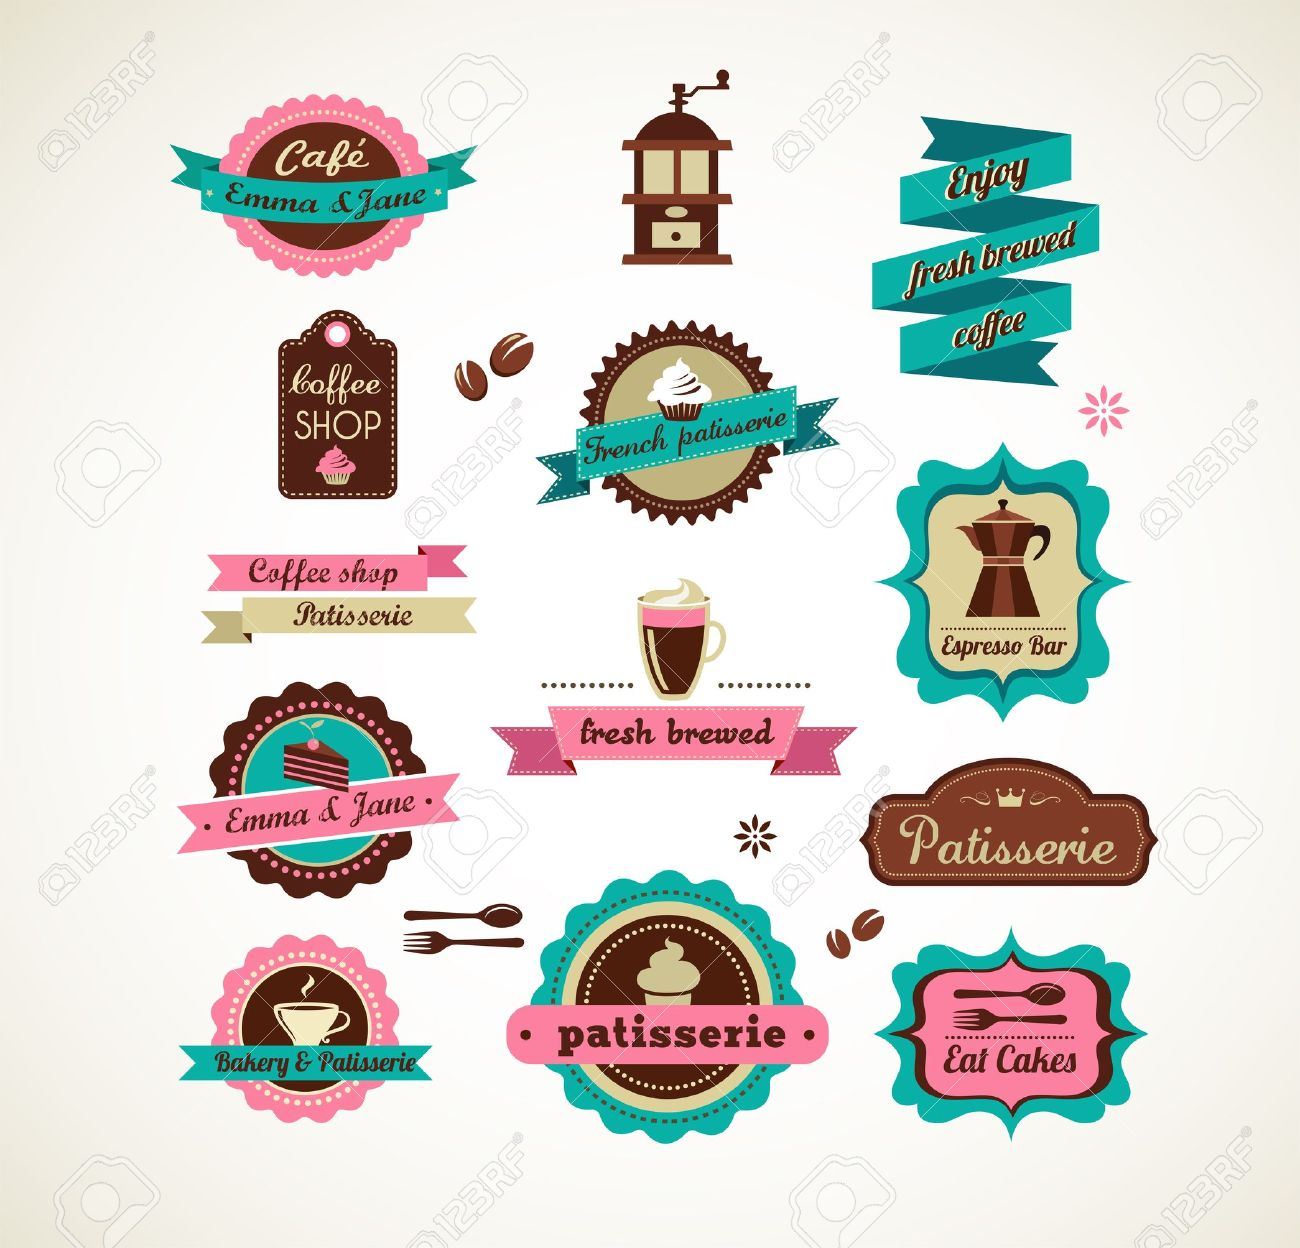 Espresso bar vinatge poster with makineta Stock Vector - 17632636